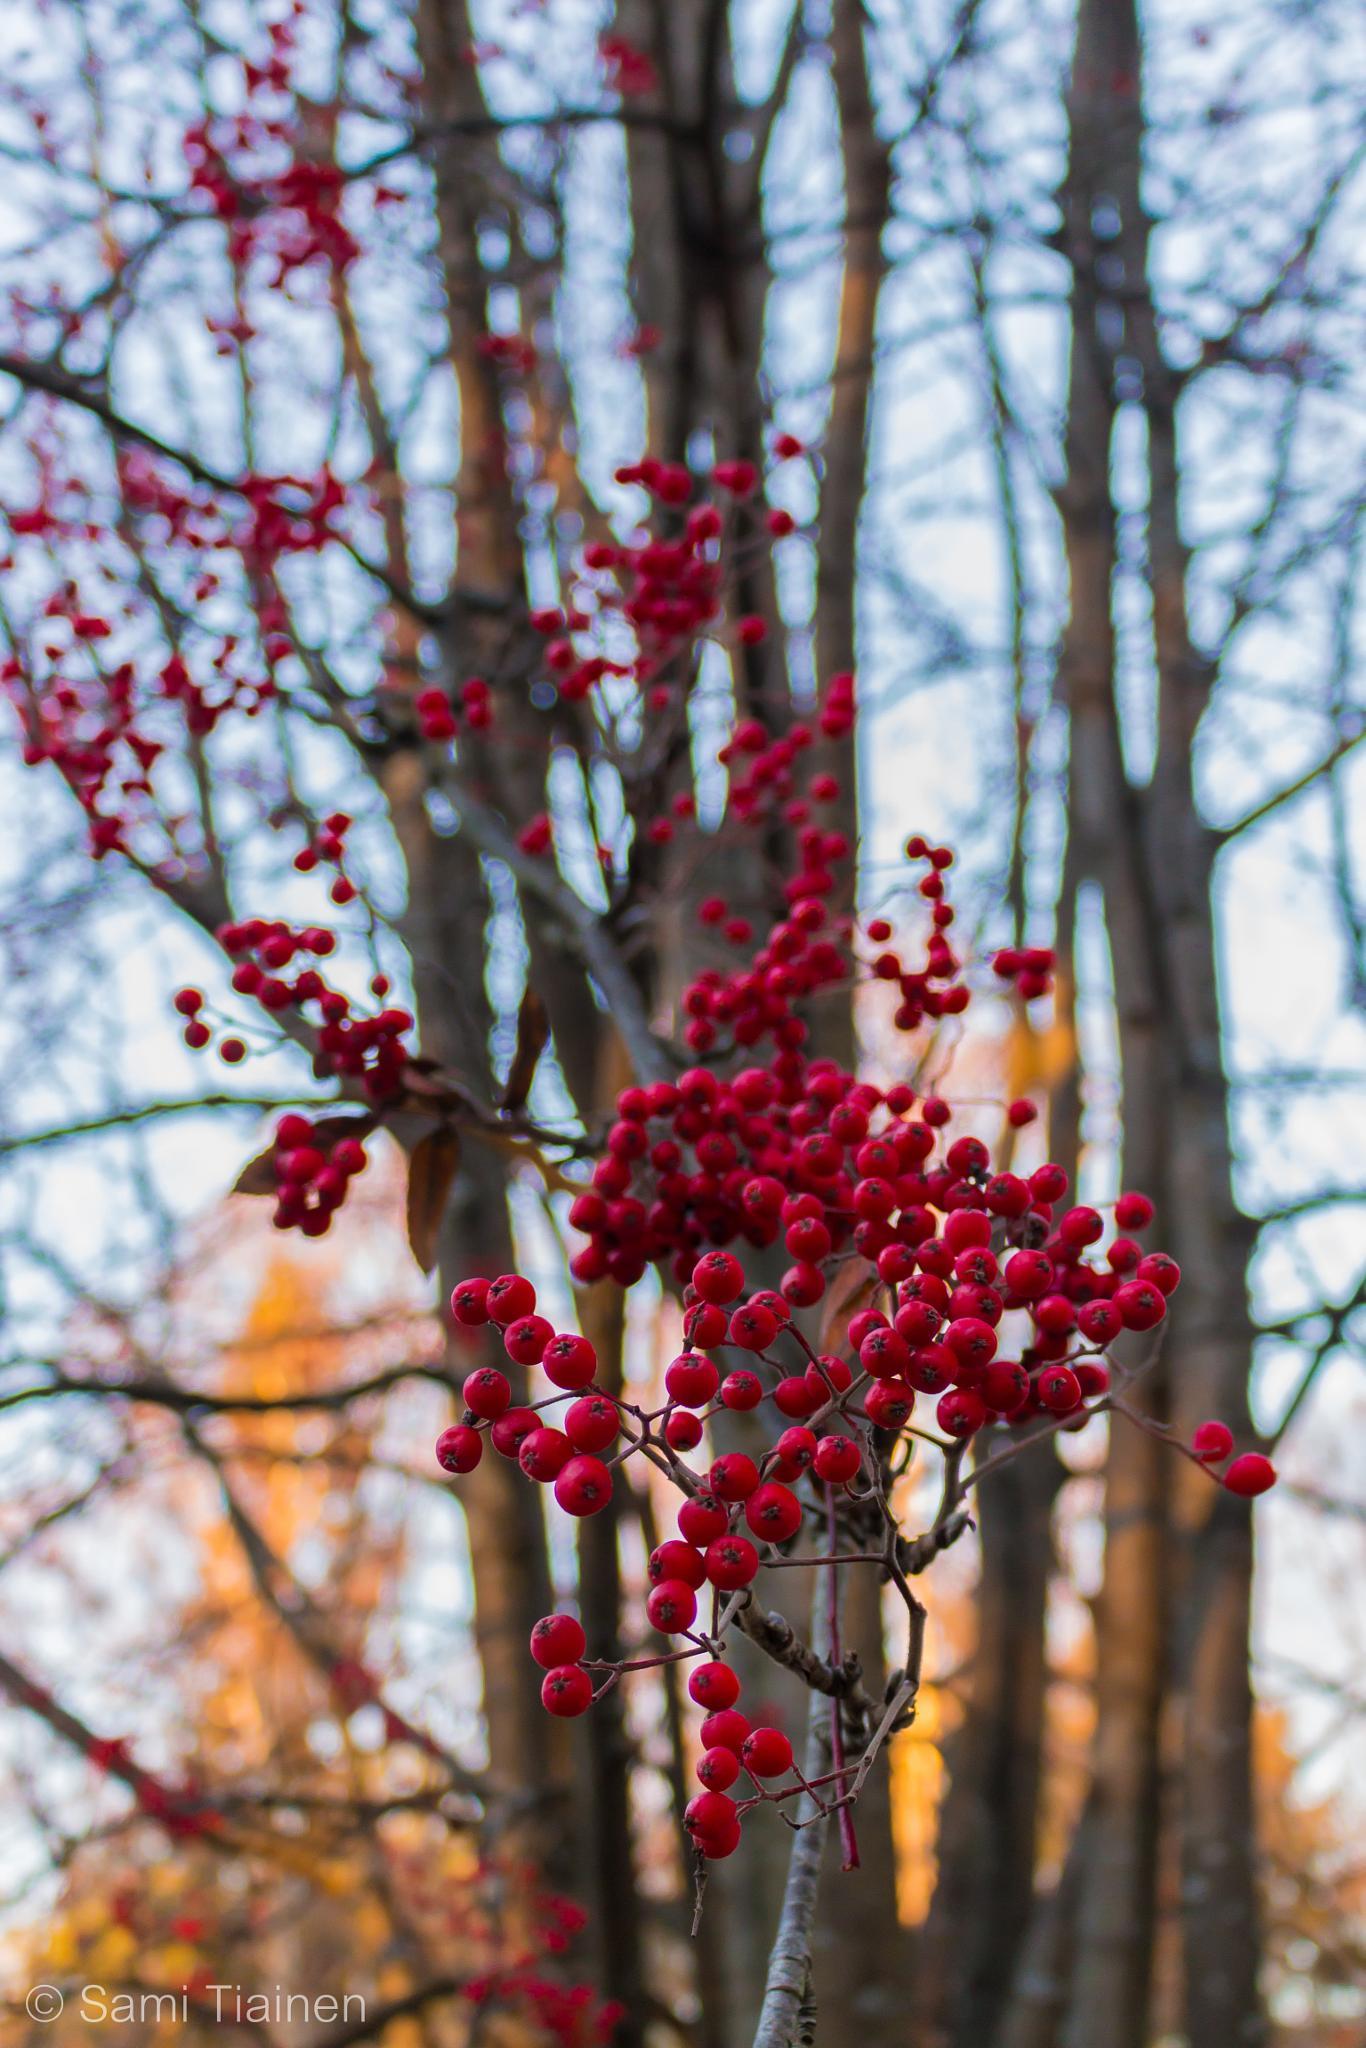 Sorbus tree - European Rowan by Sami Tiainen